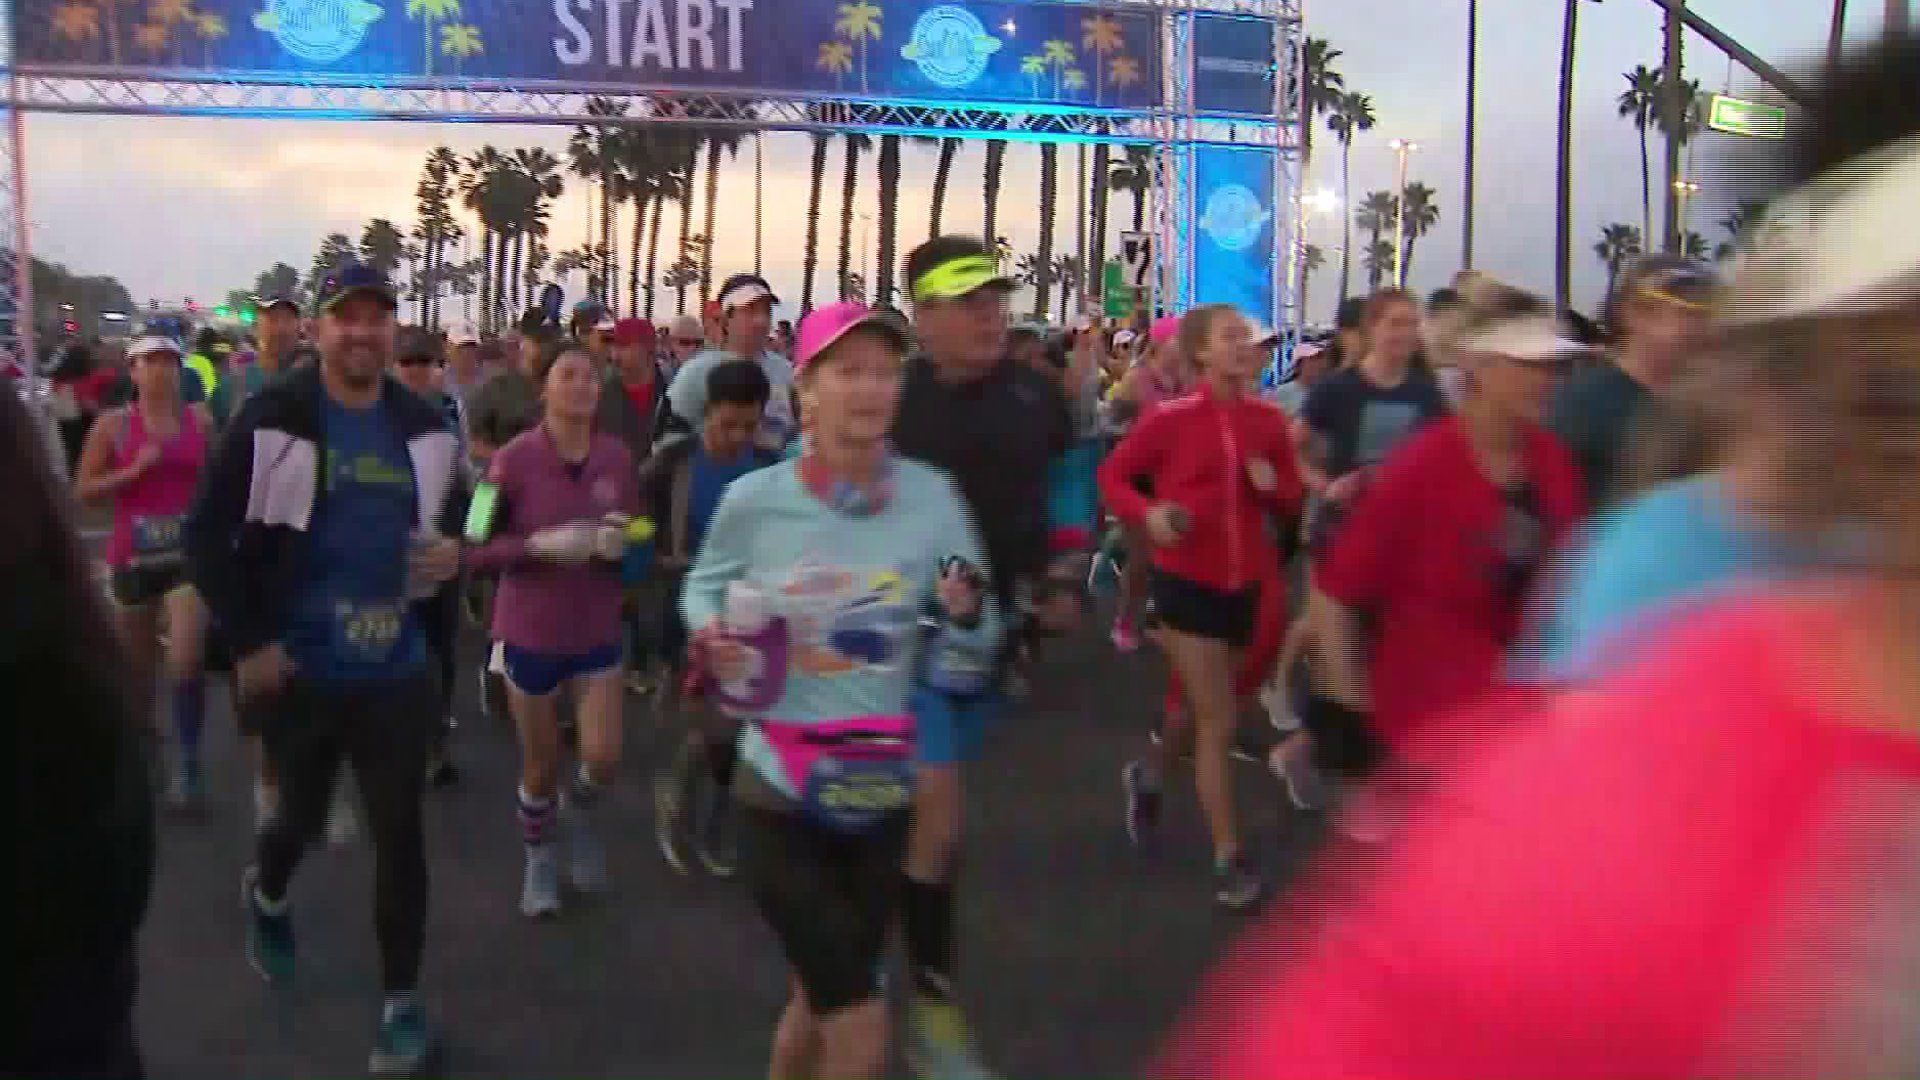 Runners race at the Surf City Marathon in Huntington Beach on Feb. 2, 2020. (Credit: KTLA)